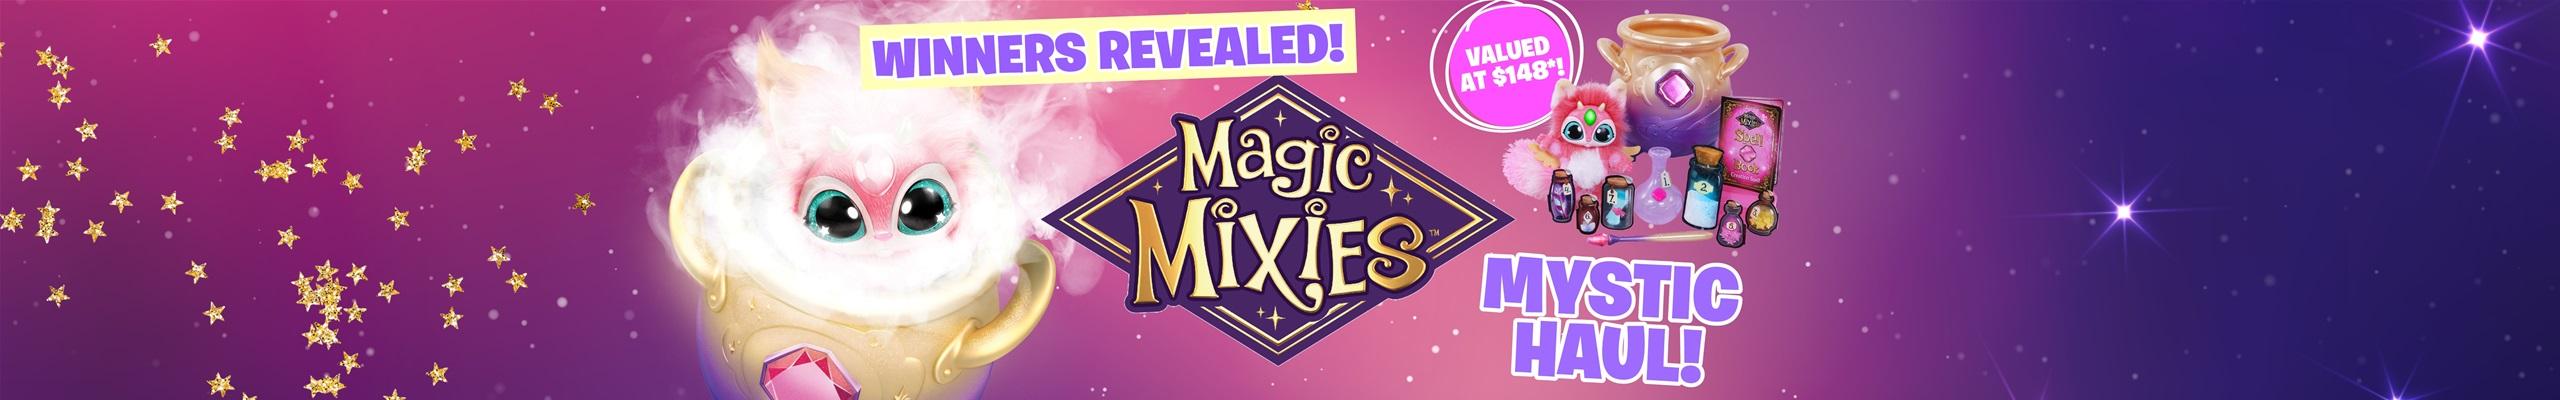 Magic Mixies Winners Revealed!